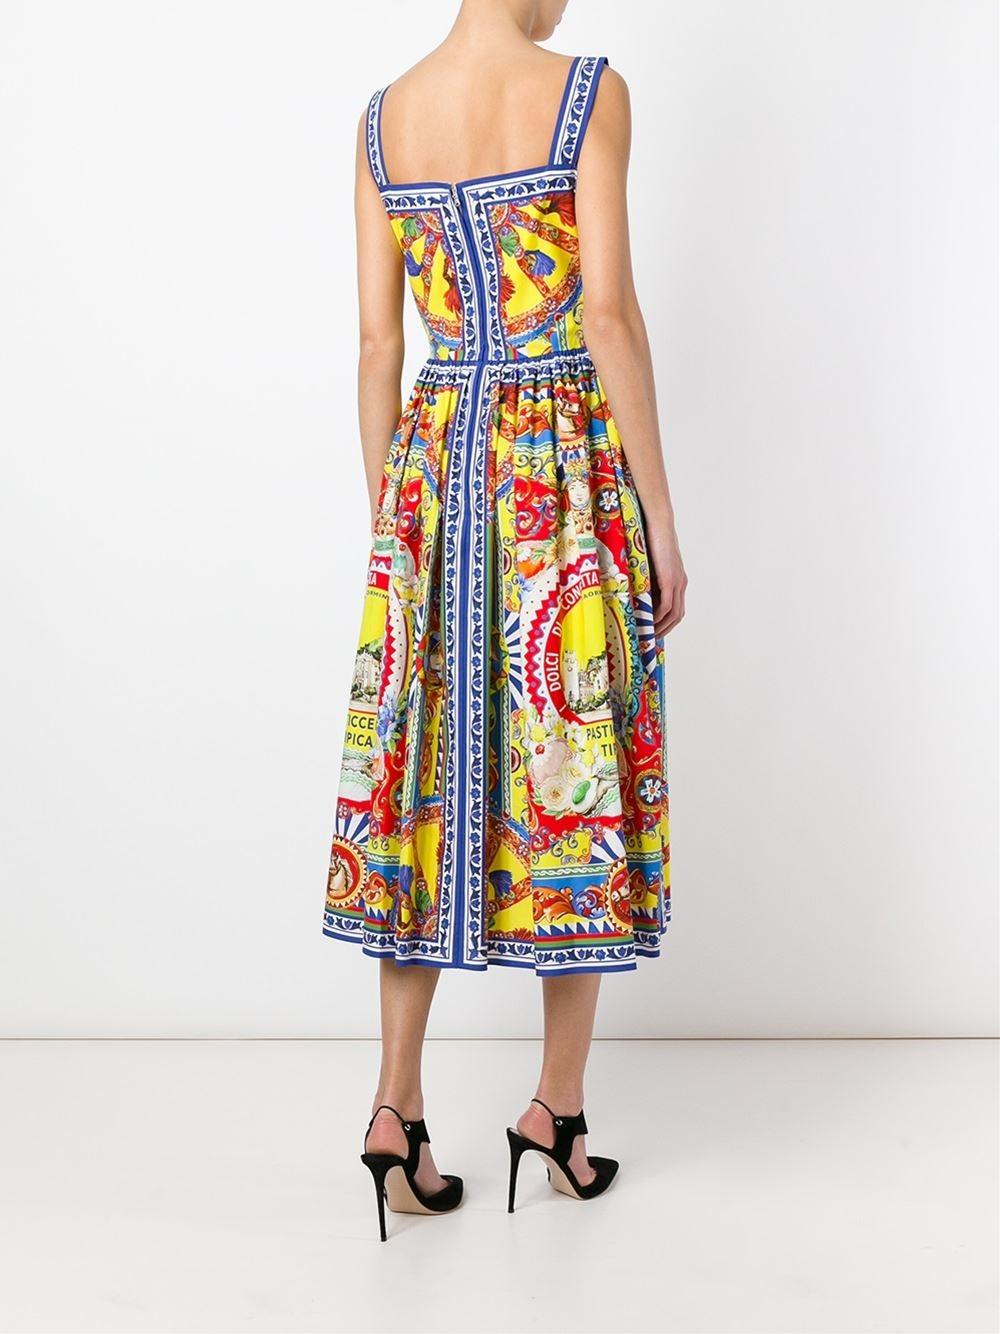 Dolce  amp  Gabbana Printed Flare Dress - Lyst 5e6d5fc2f578d